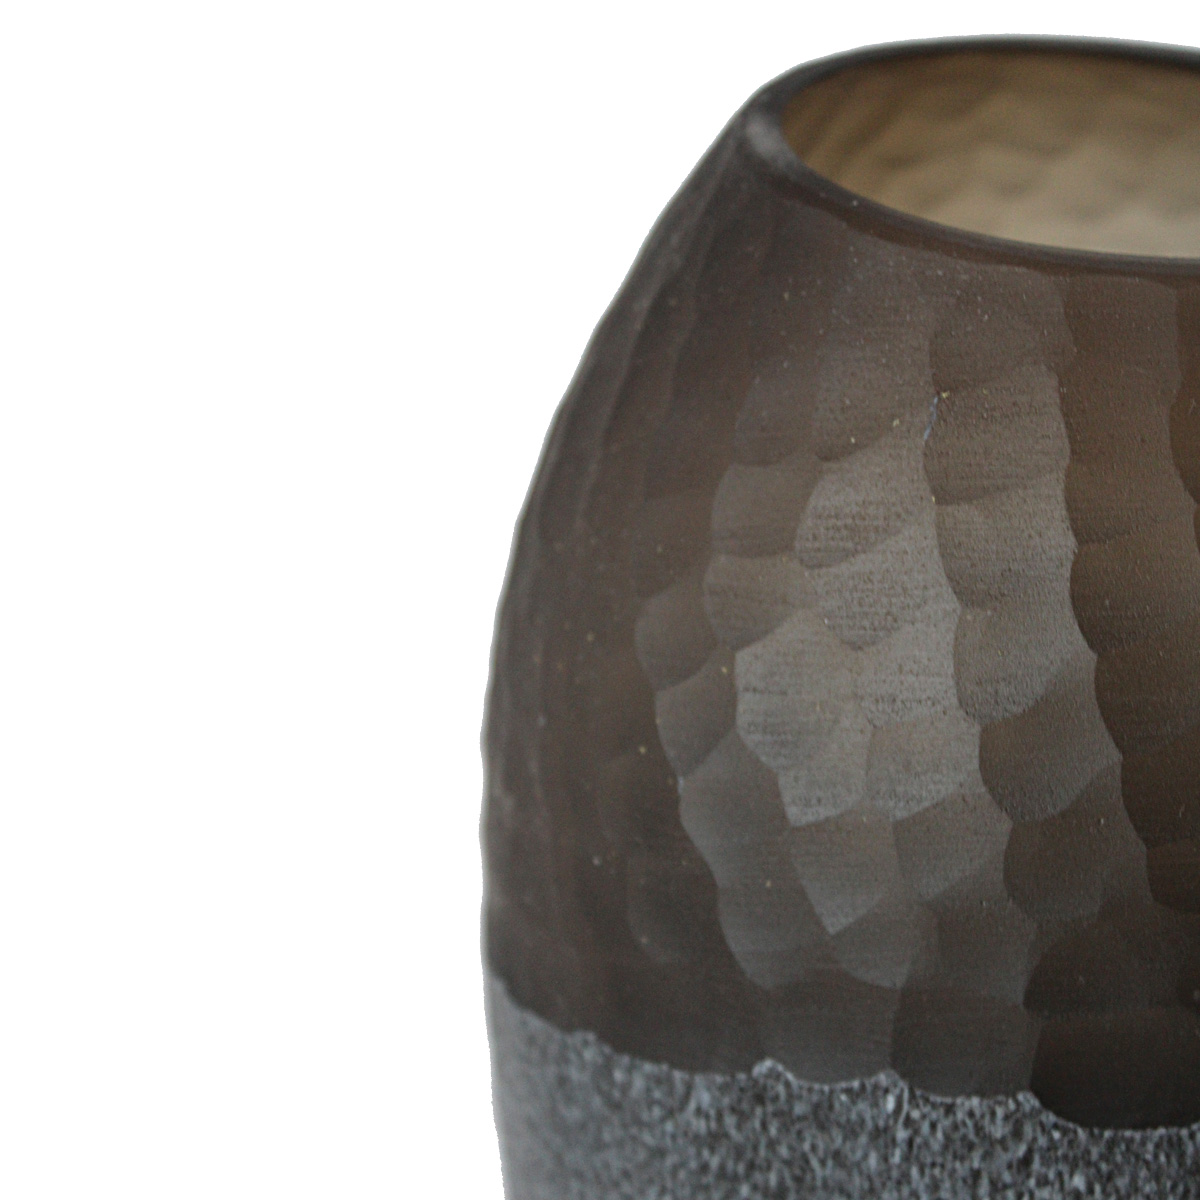 Vaza Lux staklo MUS-218